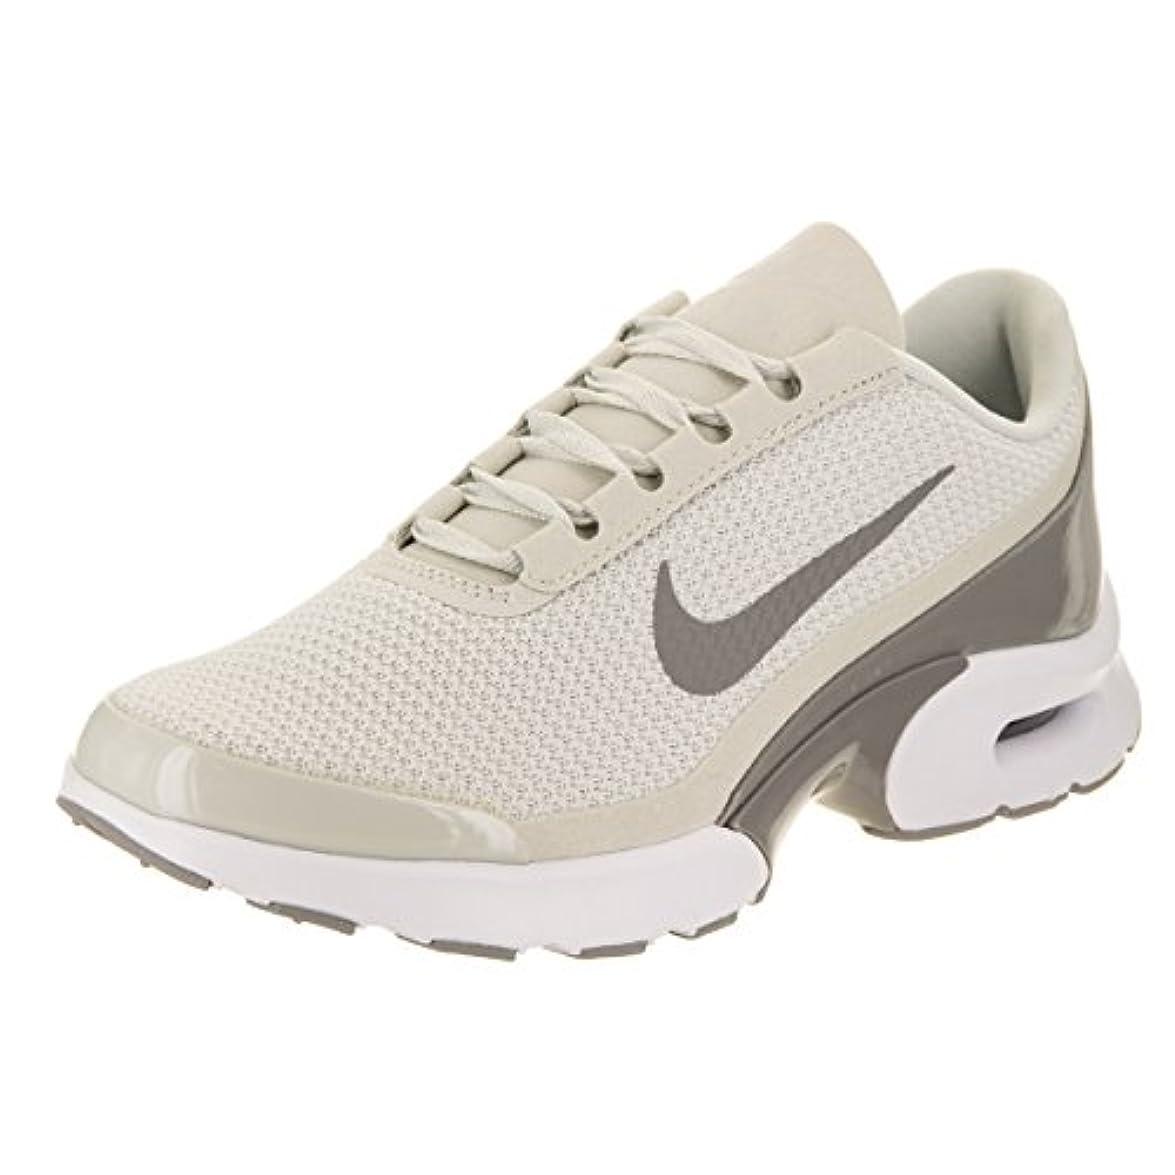 Nike Wmns Match Supreme Hi Ltr Scarpe Sportive Donna